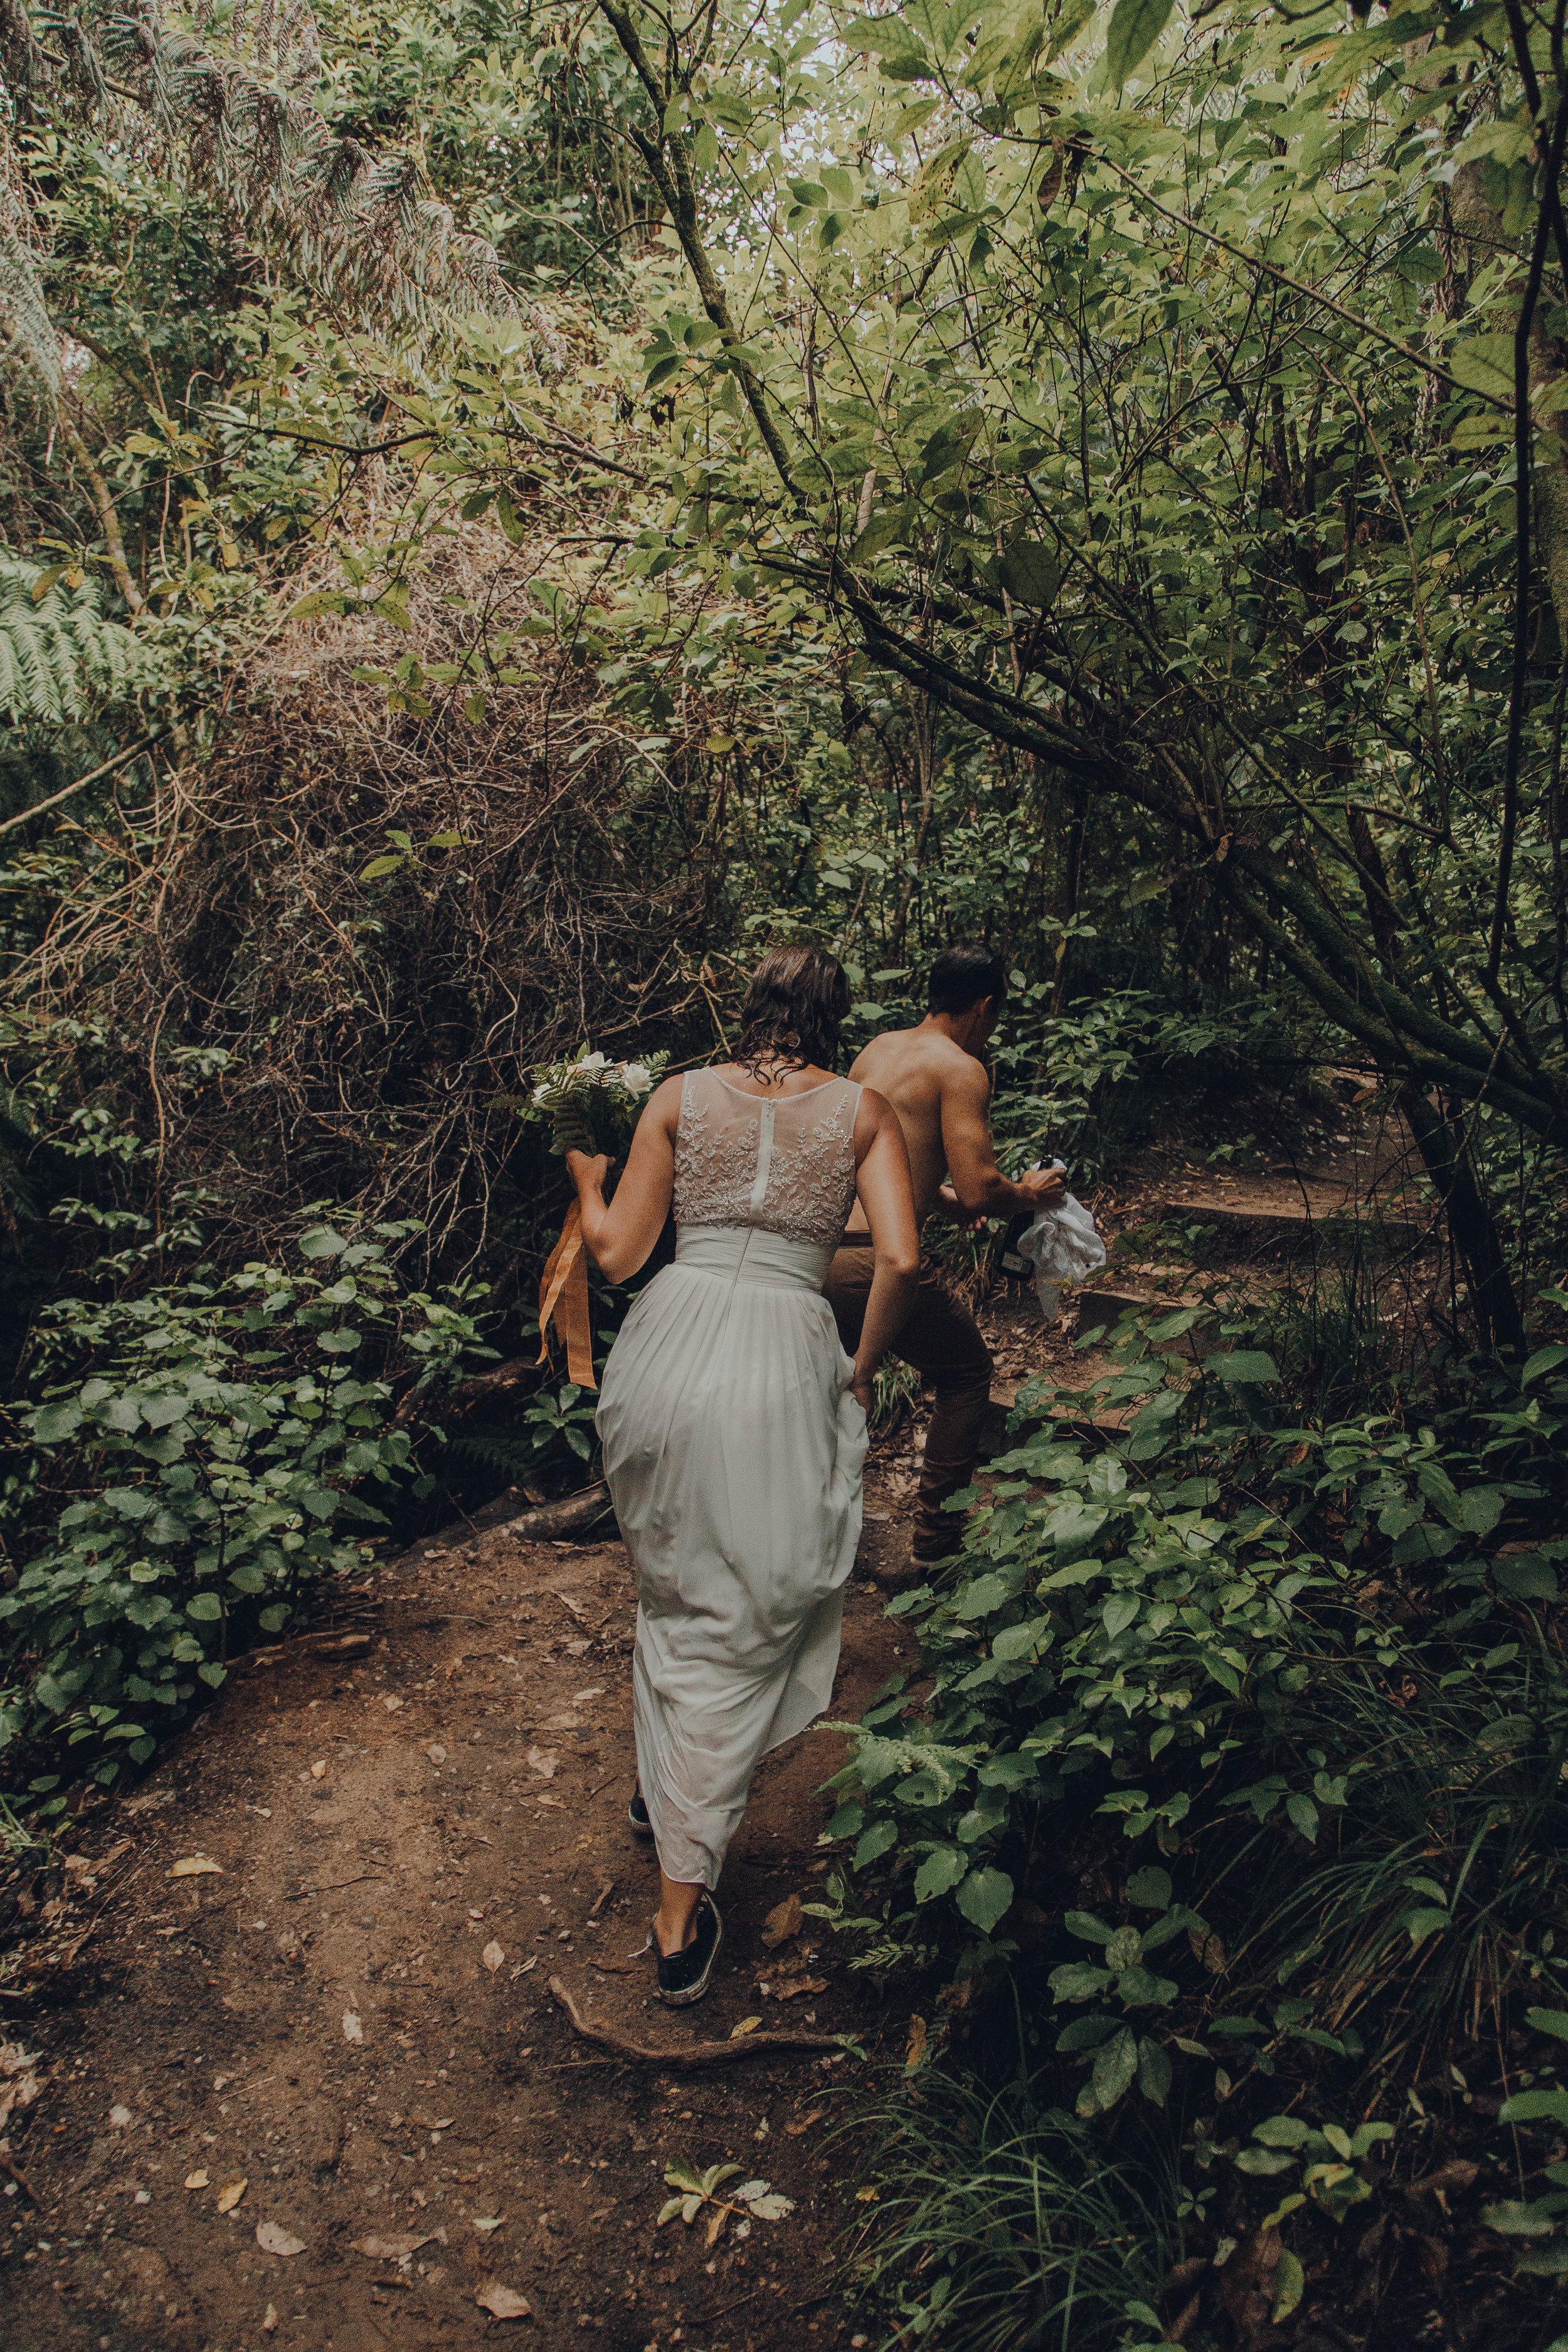 David+&+Jasmin+Wedding-3598.jpg